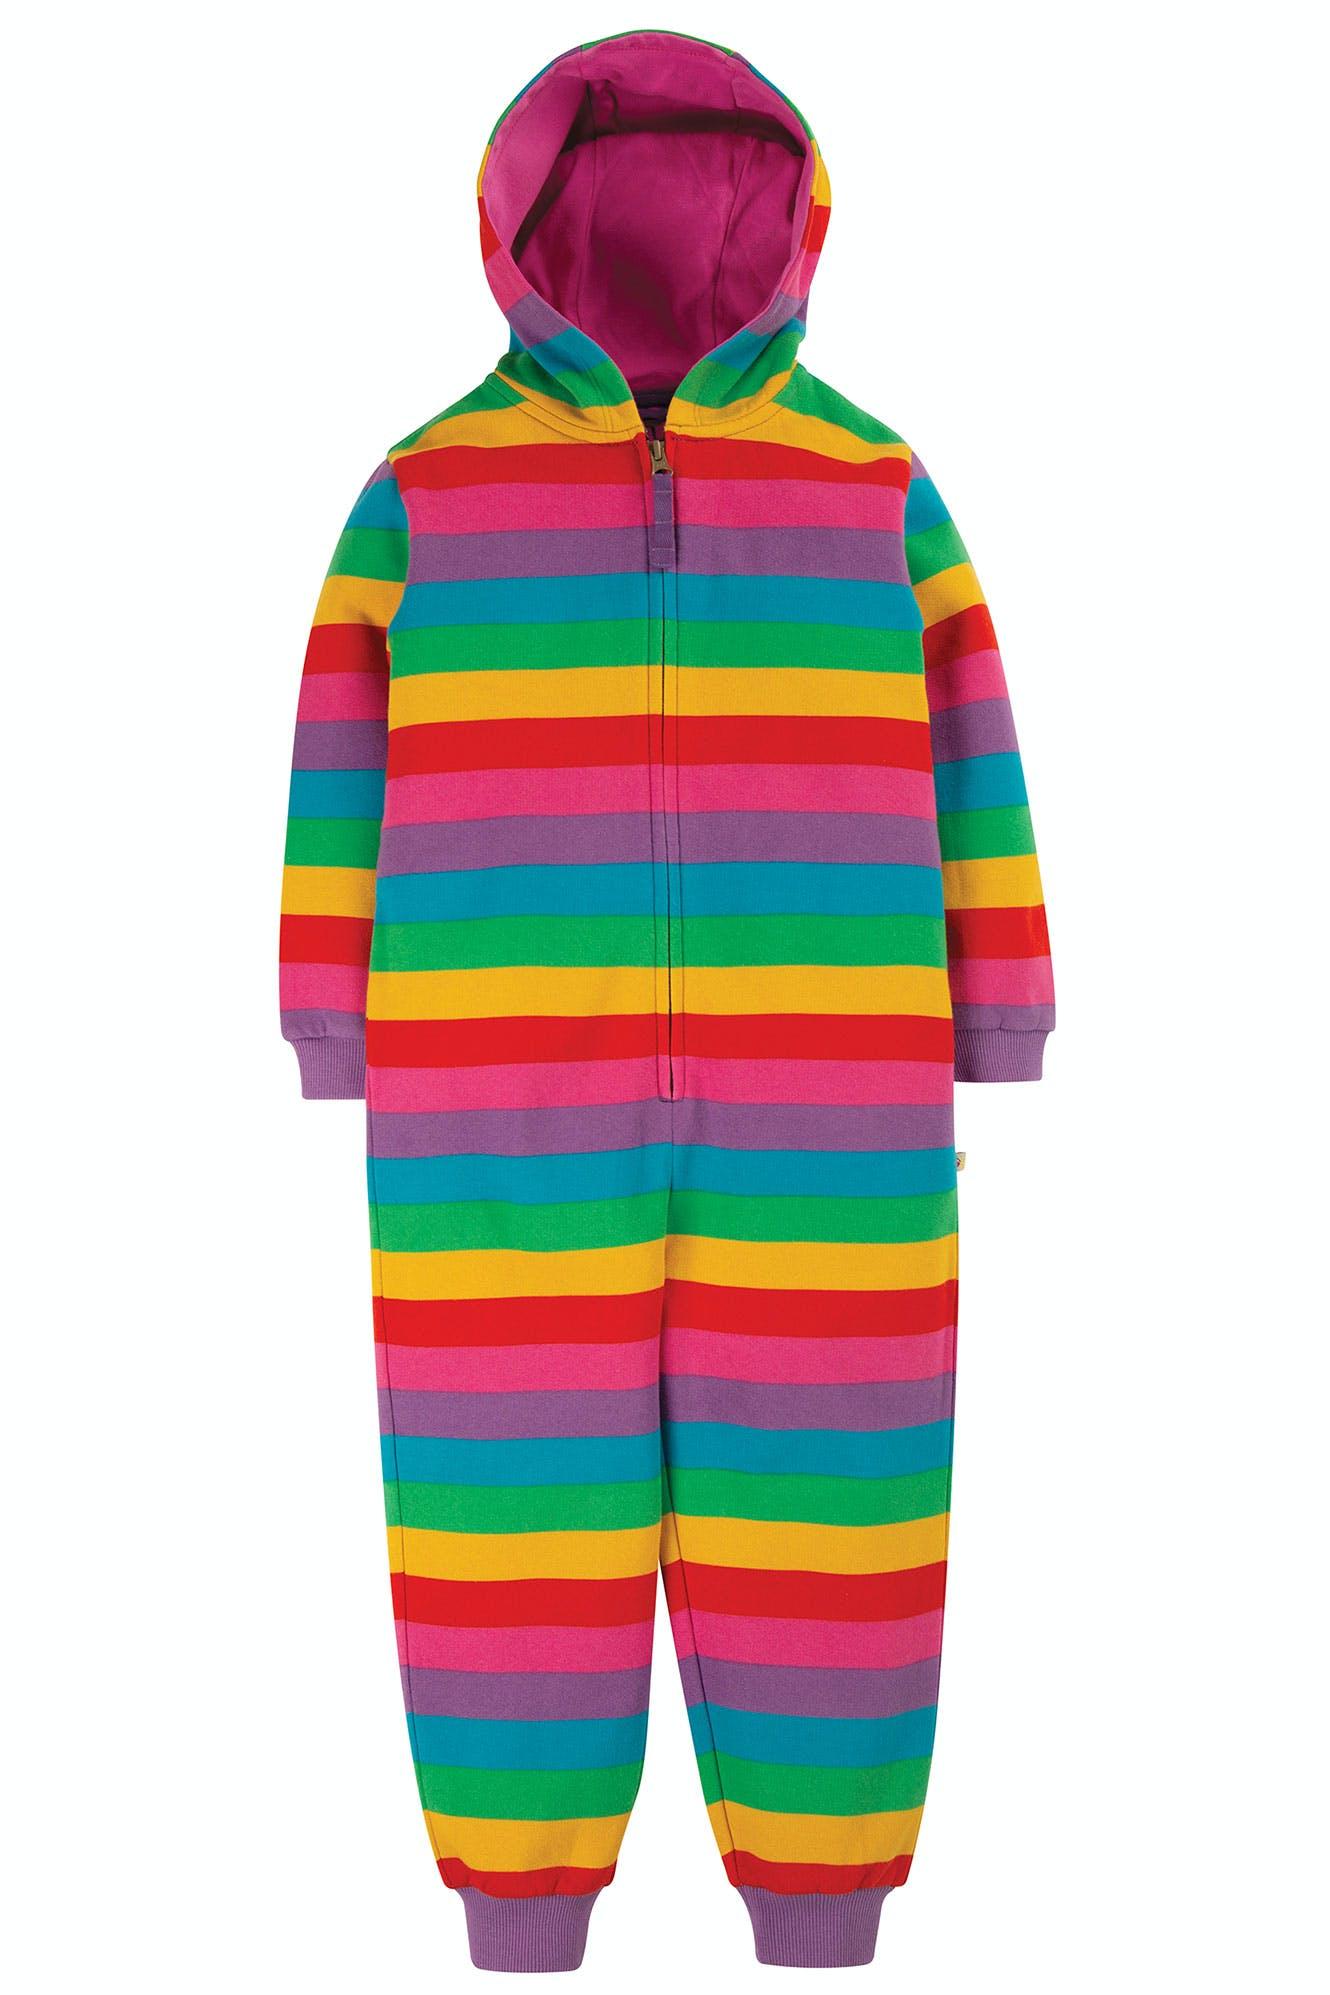 SALE £30.40 Frugi Big Snuggle Suit-Foxglove Rainbow Stripe (Was £38)